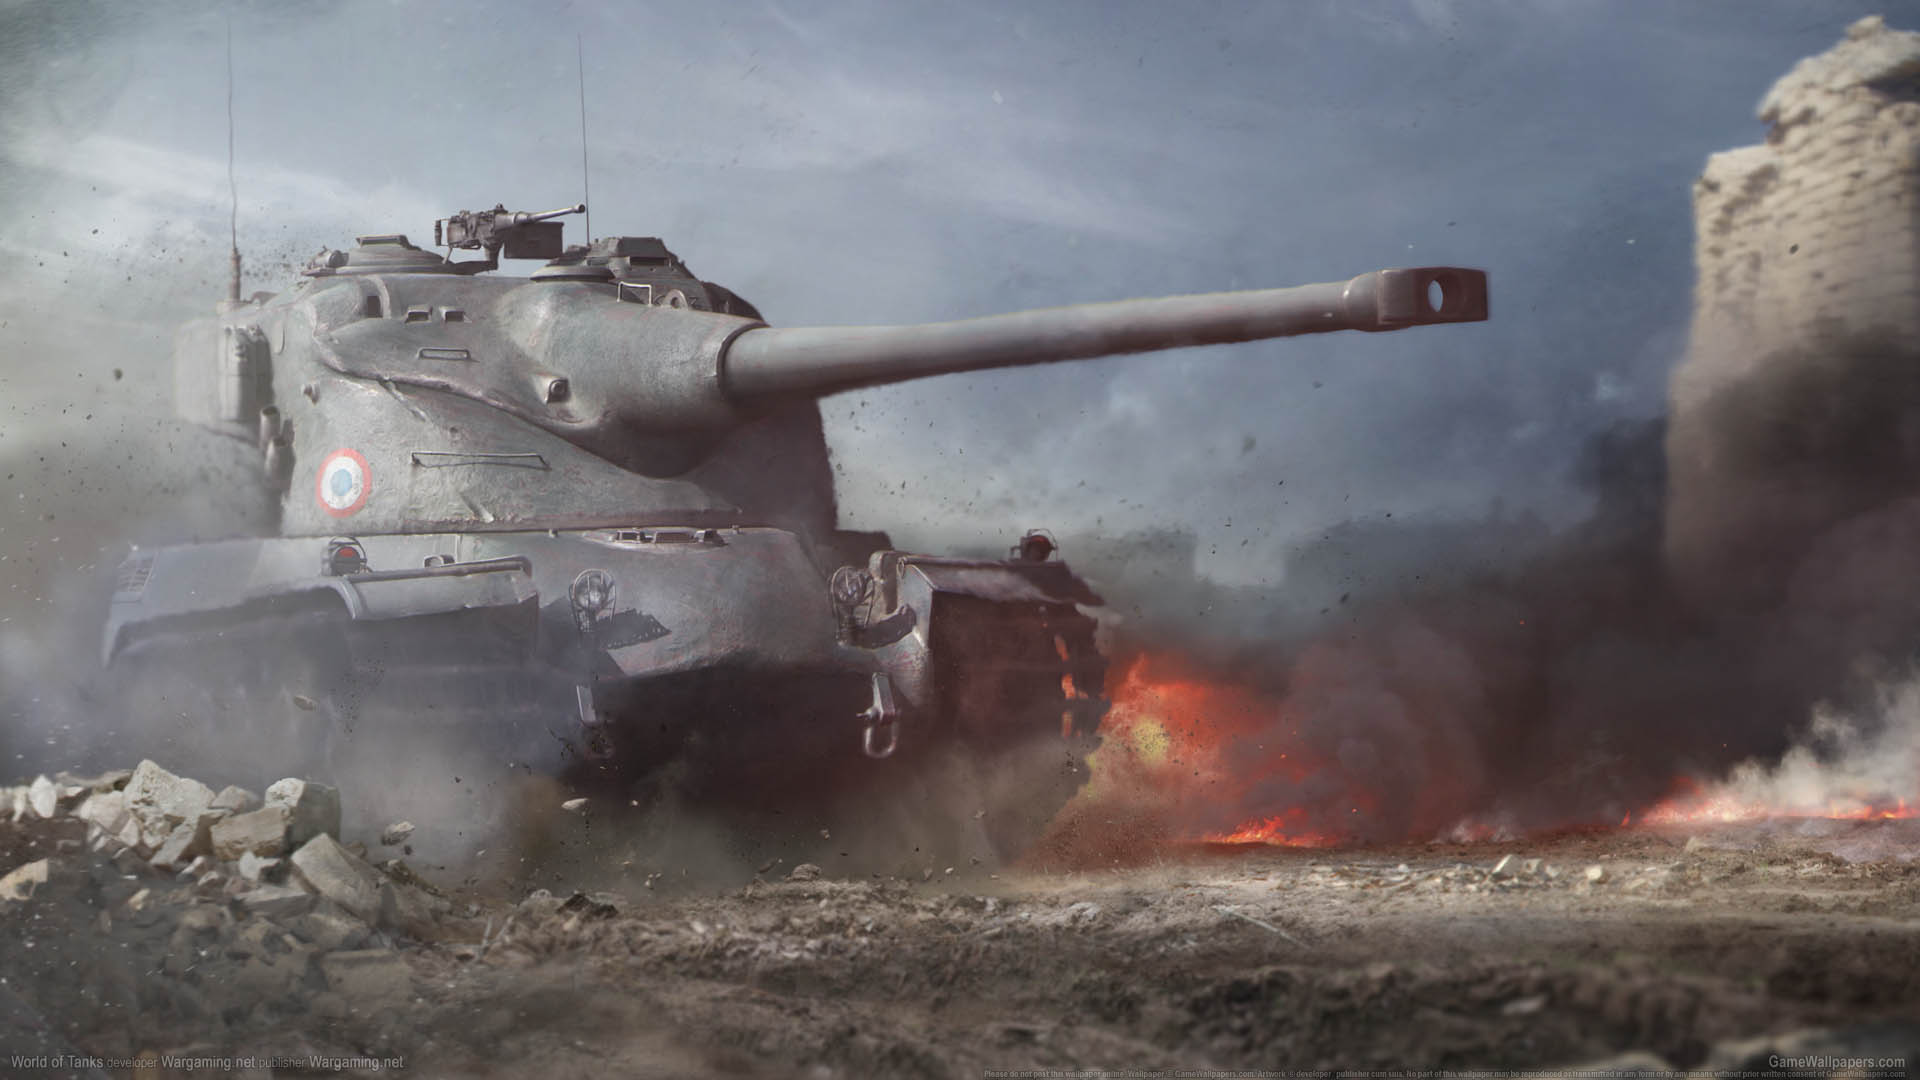 World Of Tanks Wallpaper 16 1920x1080